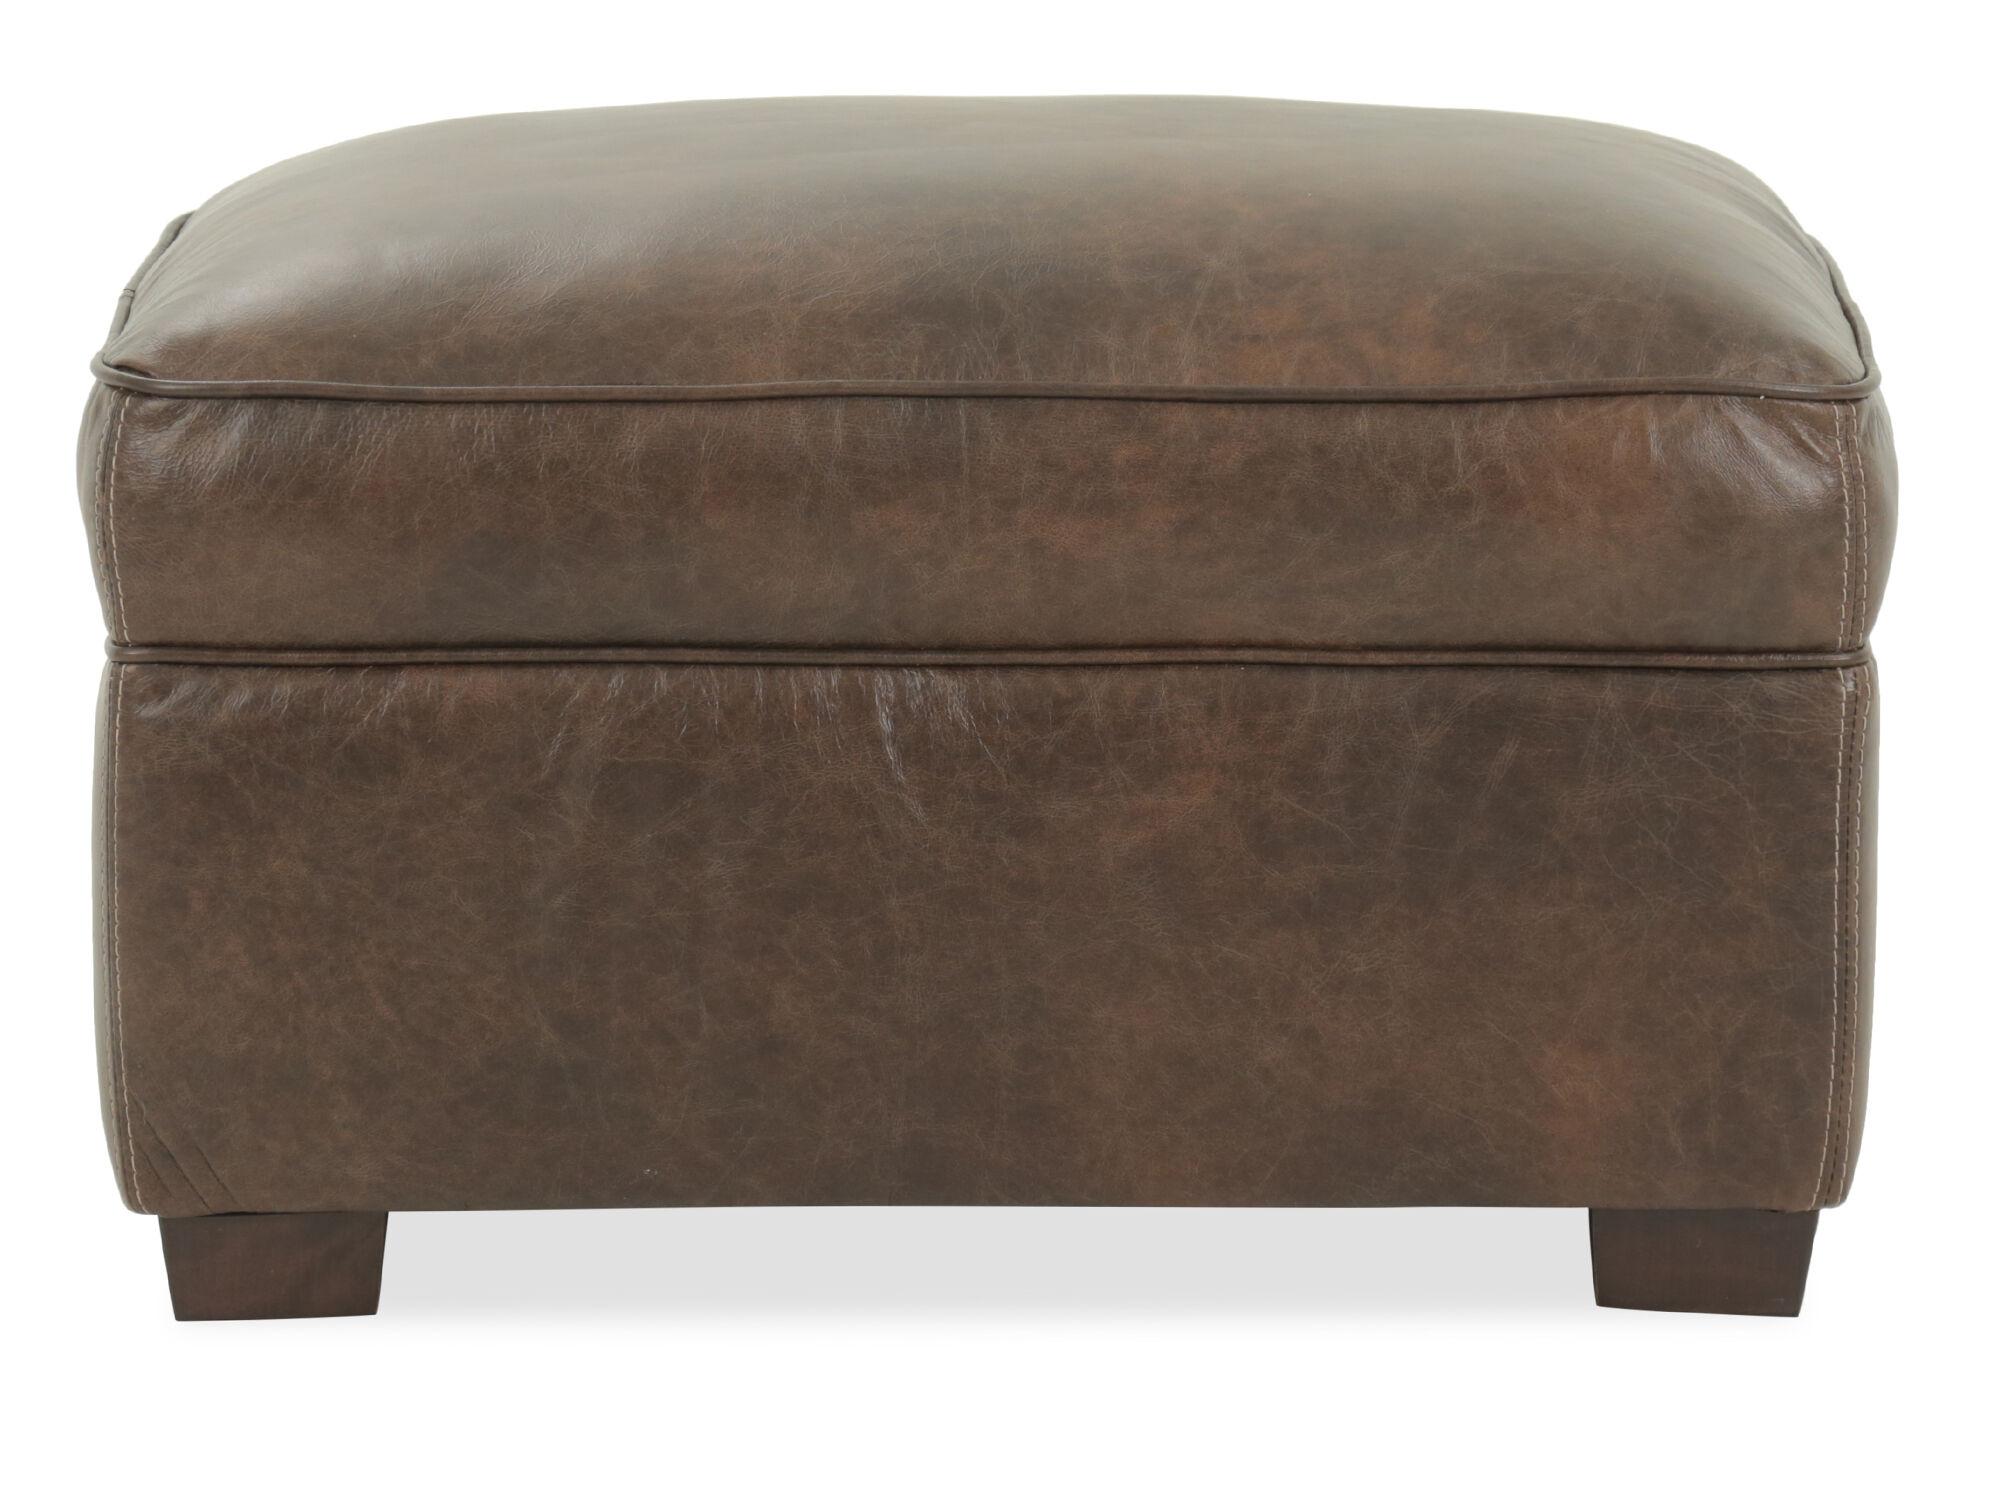 michael nicholas aspen sofa slate grey velvet simon li furniture | mathis brothers